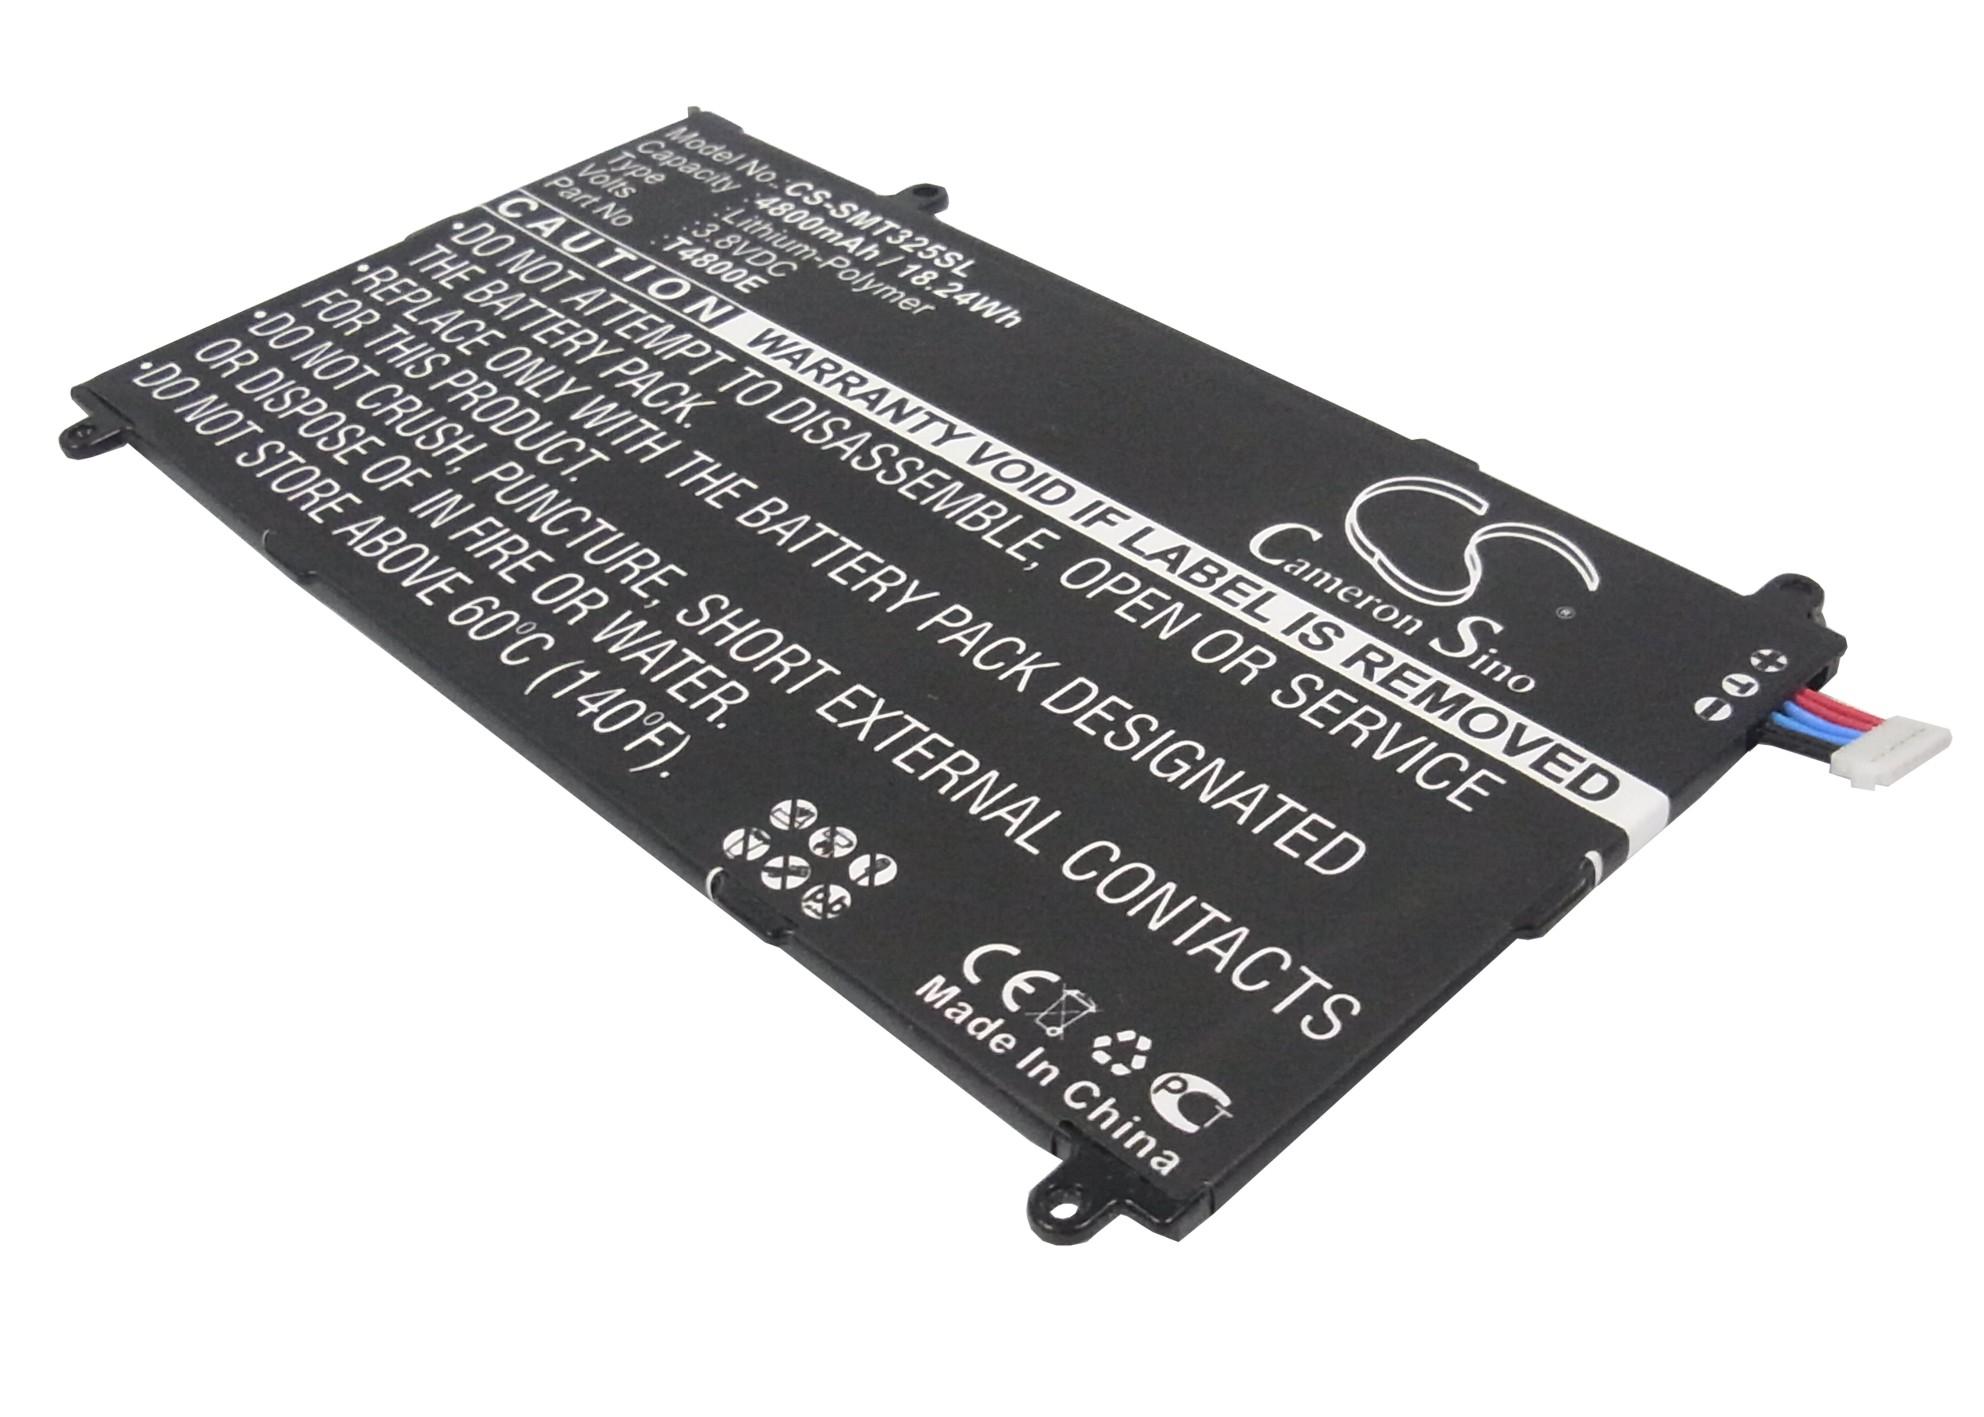 Cameron Sino baterie do tabletů pro SAMSUNG SM-T320 3.8V Li-Polymer 4800mAh černá - neoriginální